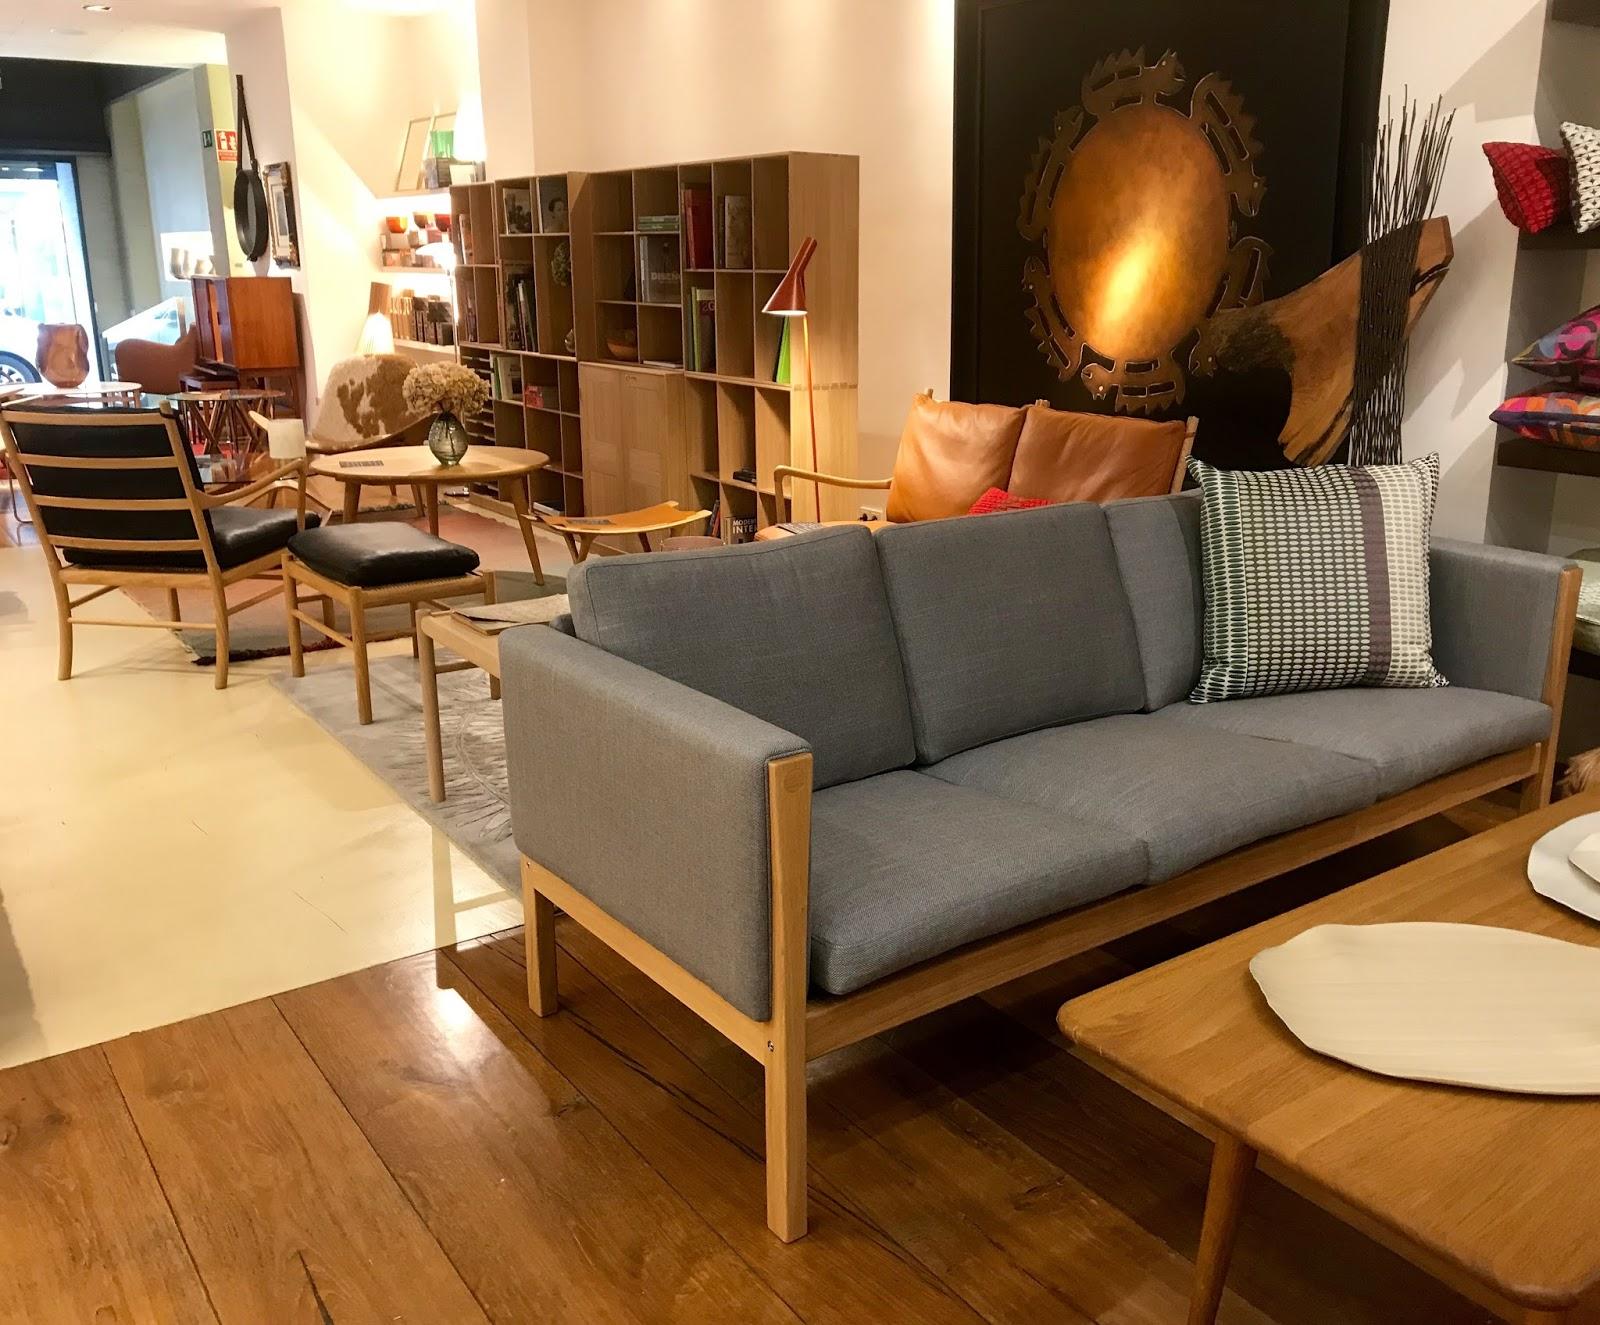 hans wegner sofa ch163 double recliner carl hansen en exposicion chic soul tela kvadrat